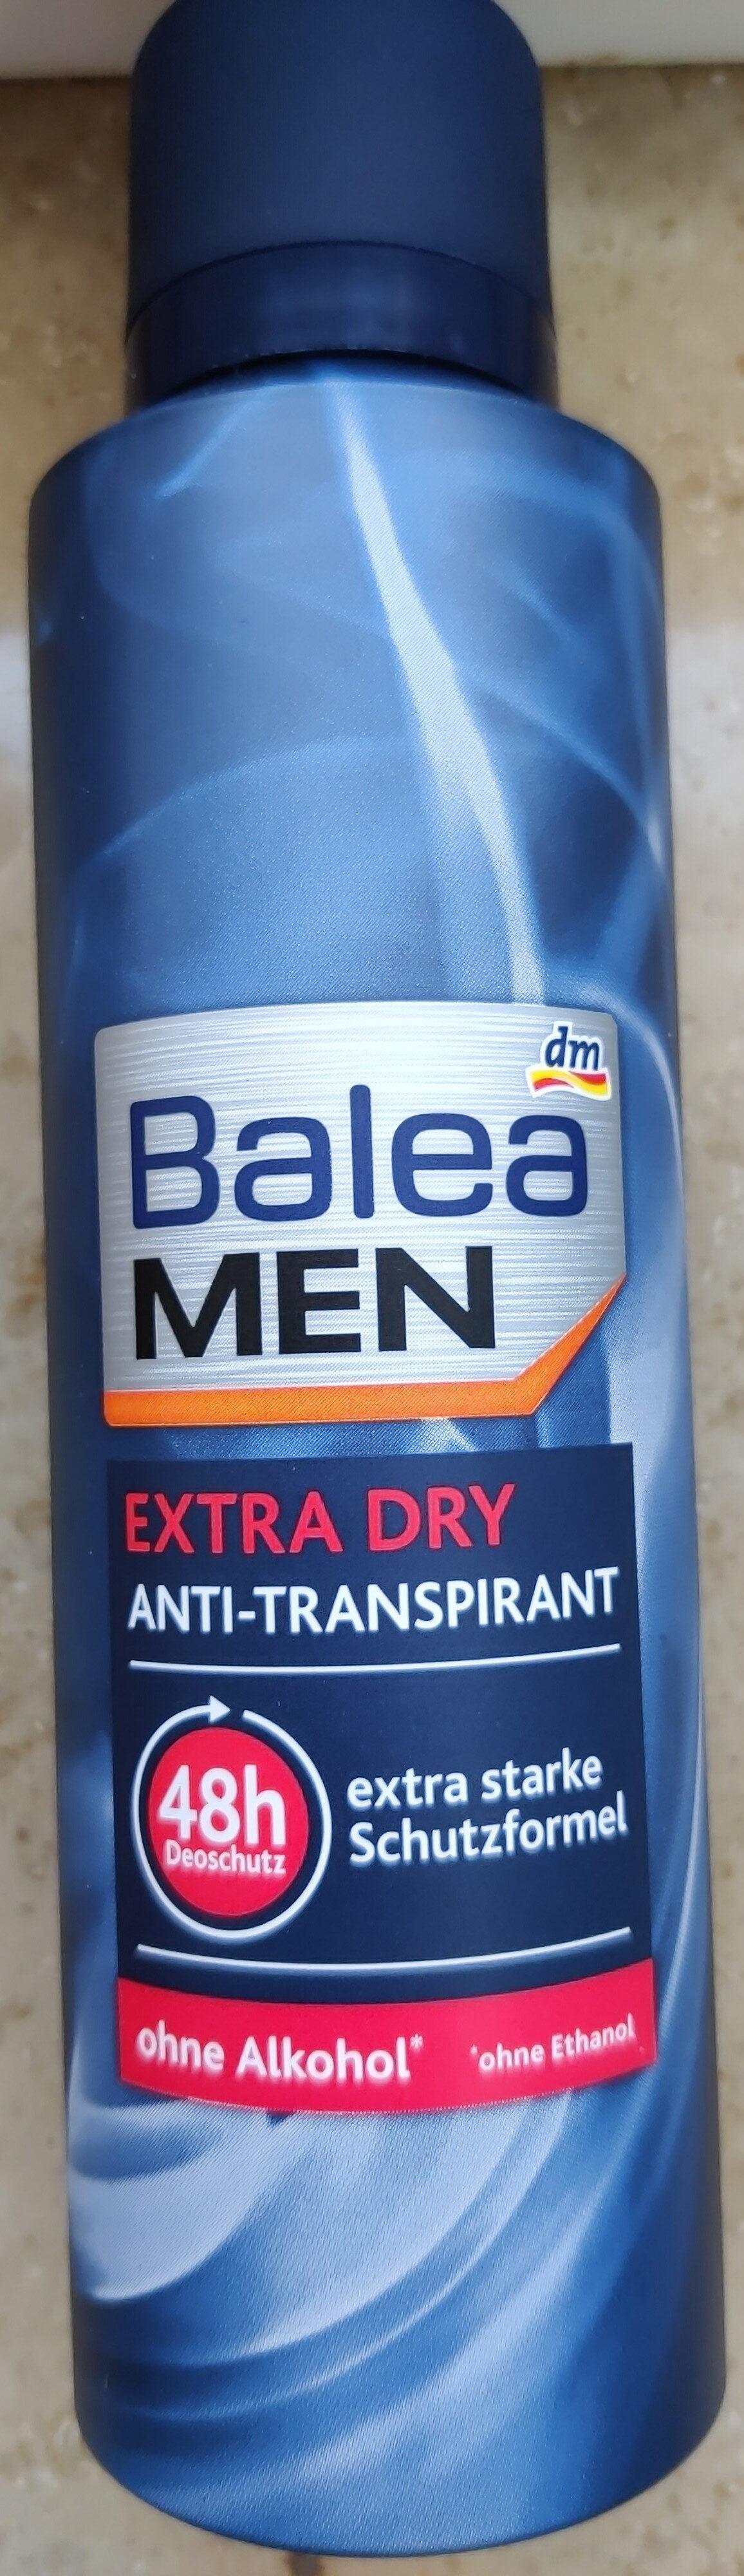 Deospray Antitranspirant Extra Dry - Продукт - de